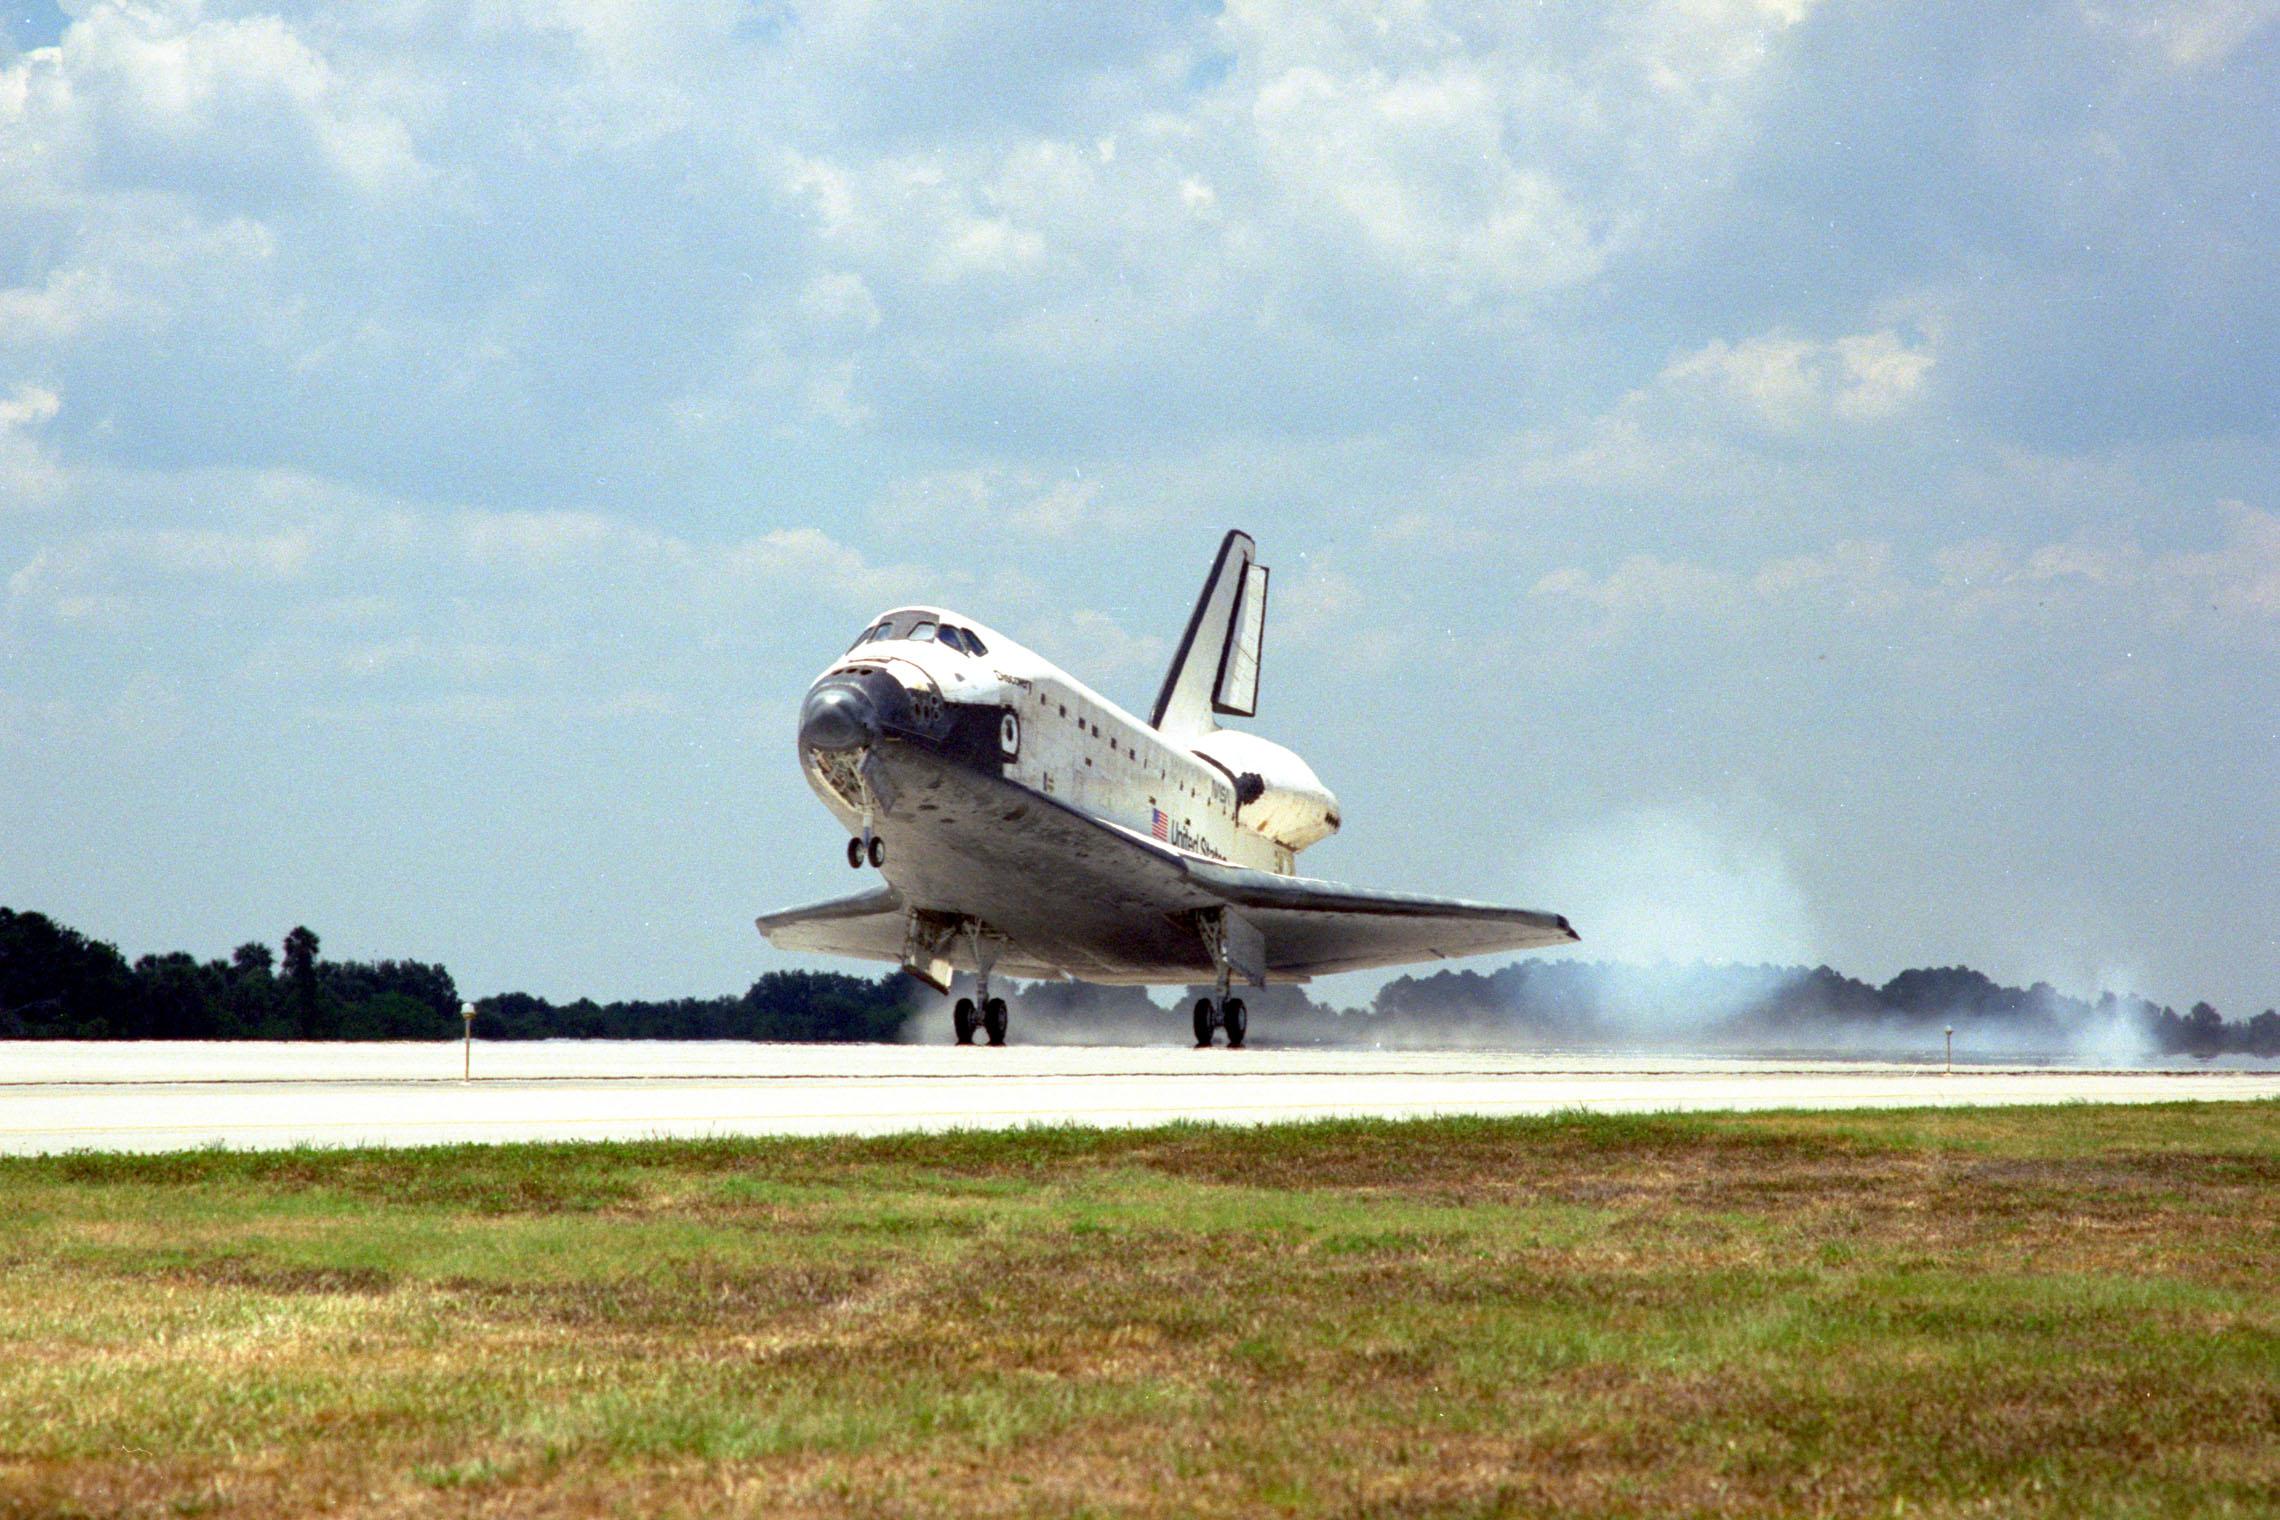 space shuttle landing strip length - photo #5